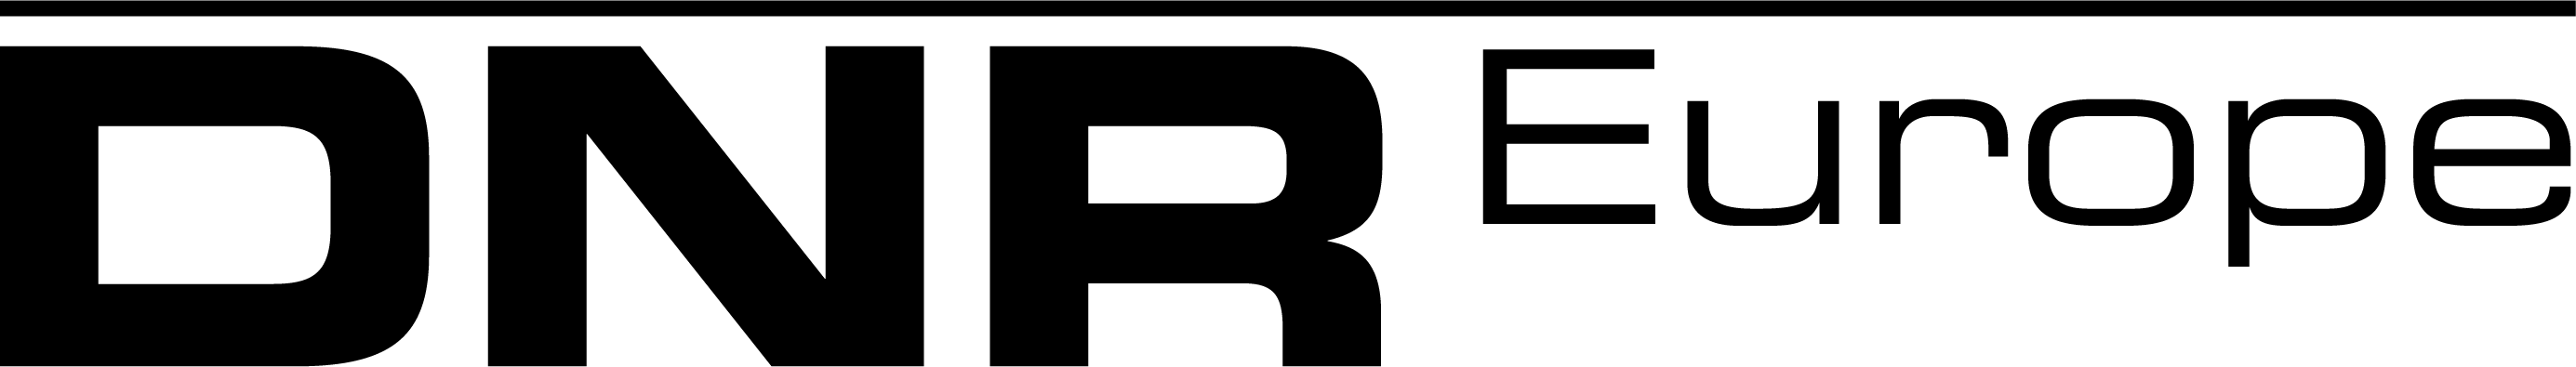 DNReurope Black